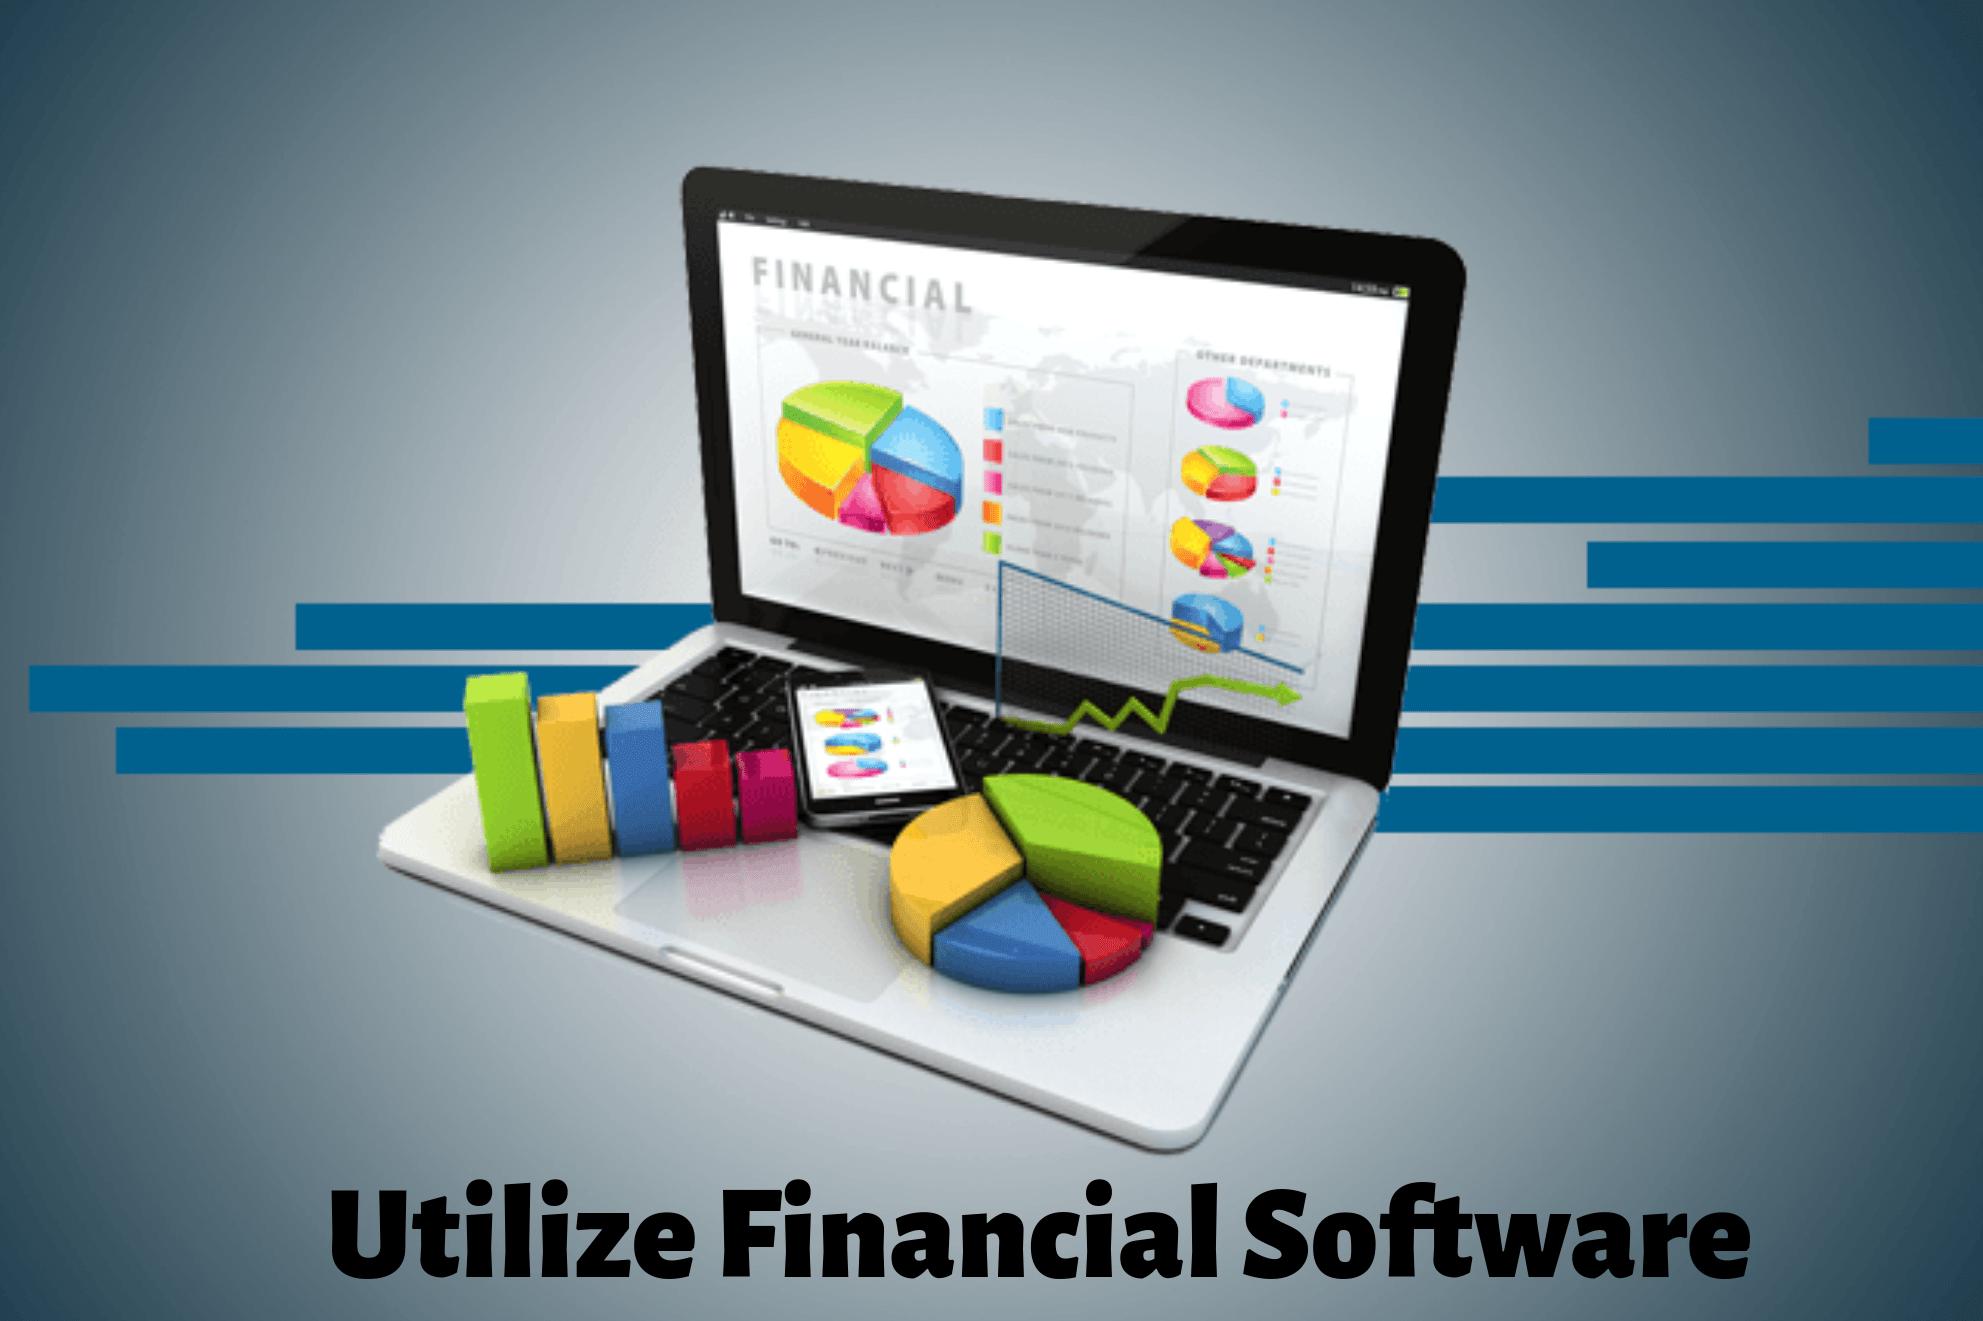 Utilize Financial Software